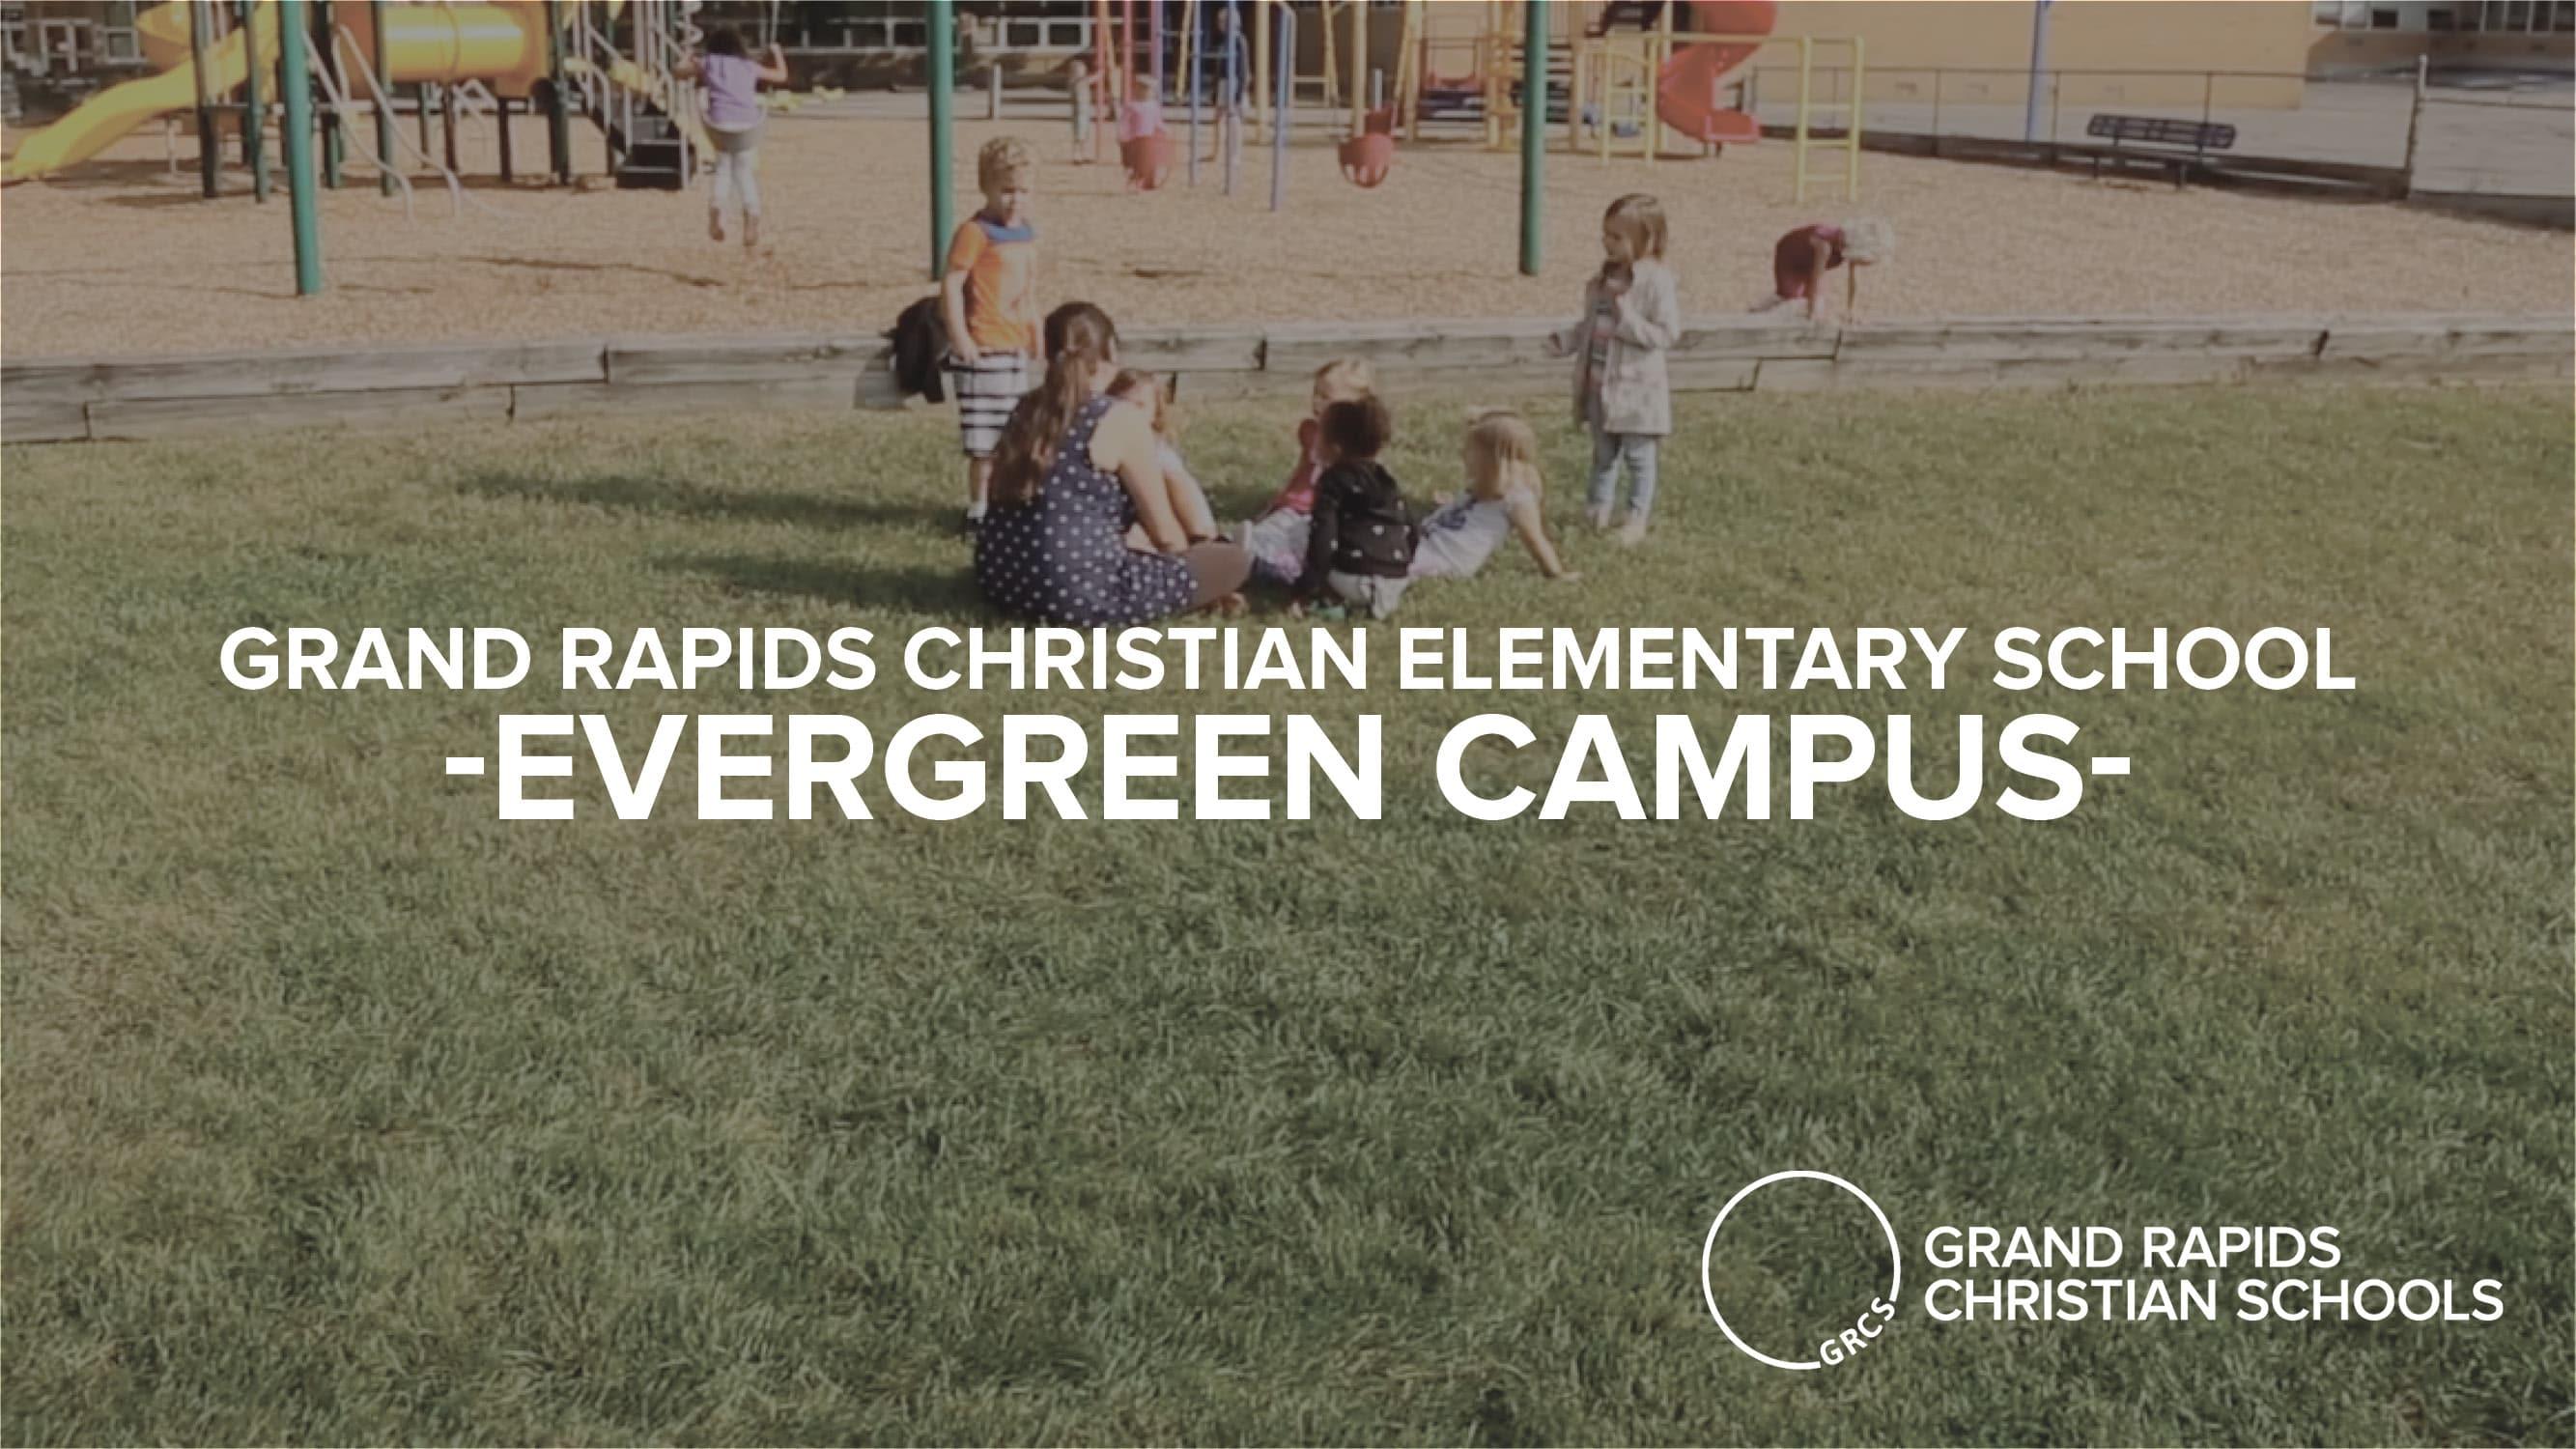 Grand Rapids Christian Elementary School Evergreen Campus